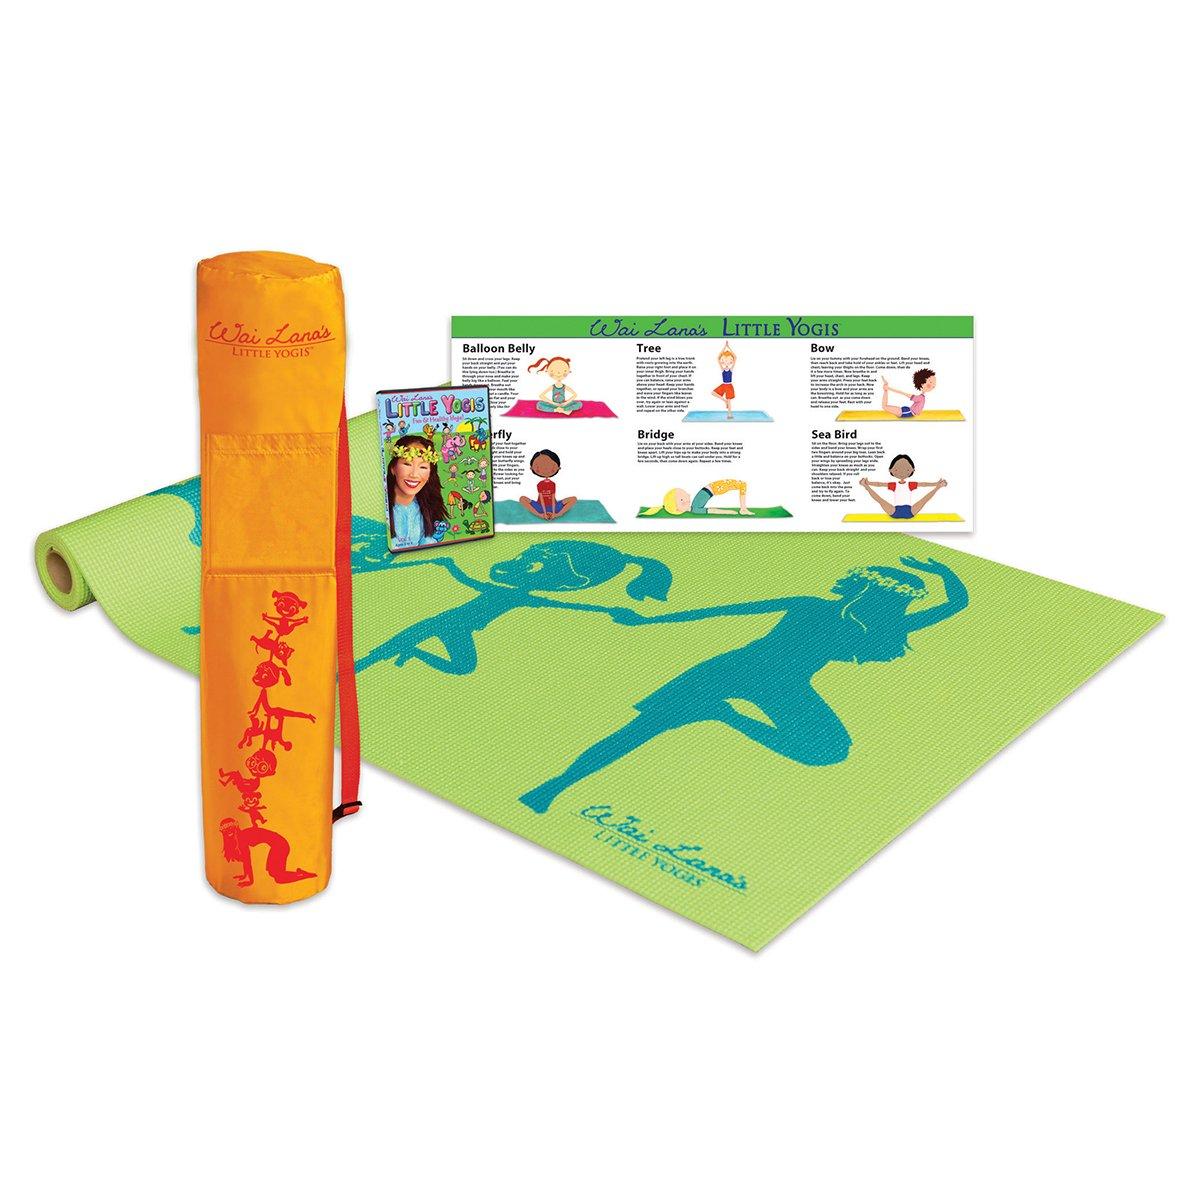 Wai Lana Little Yogis: Little Yogis Eco Tote Kit